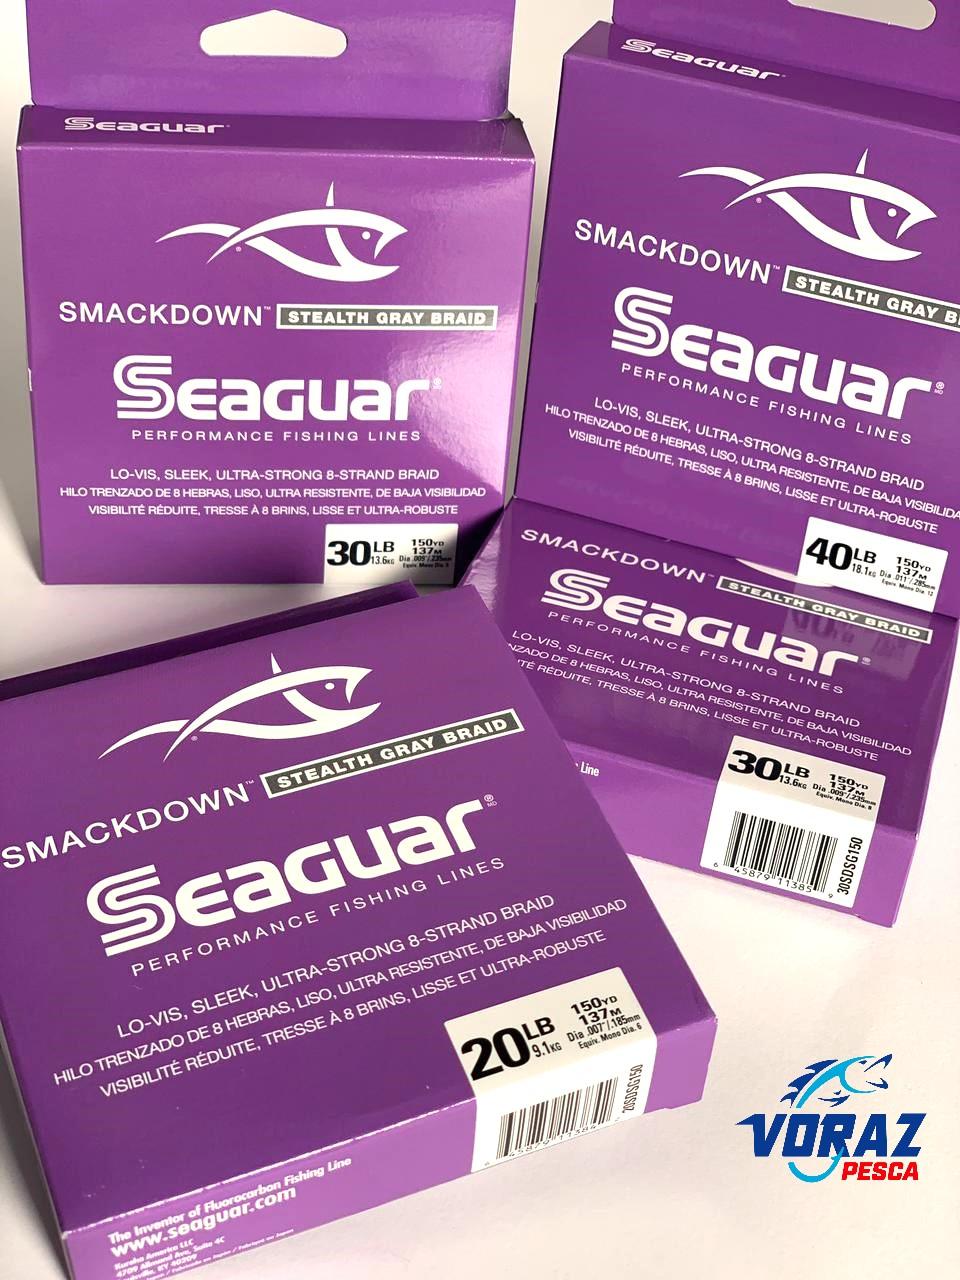 Linha Multifilamento Smackdown 8 fios Stealth Gray Braid - Seaguar